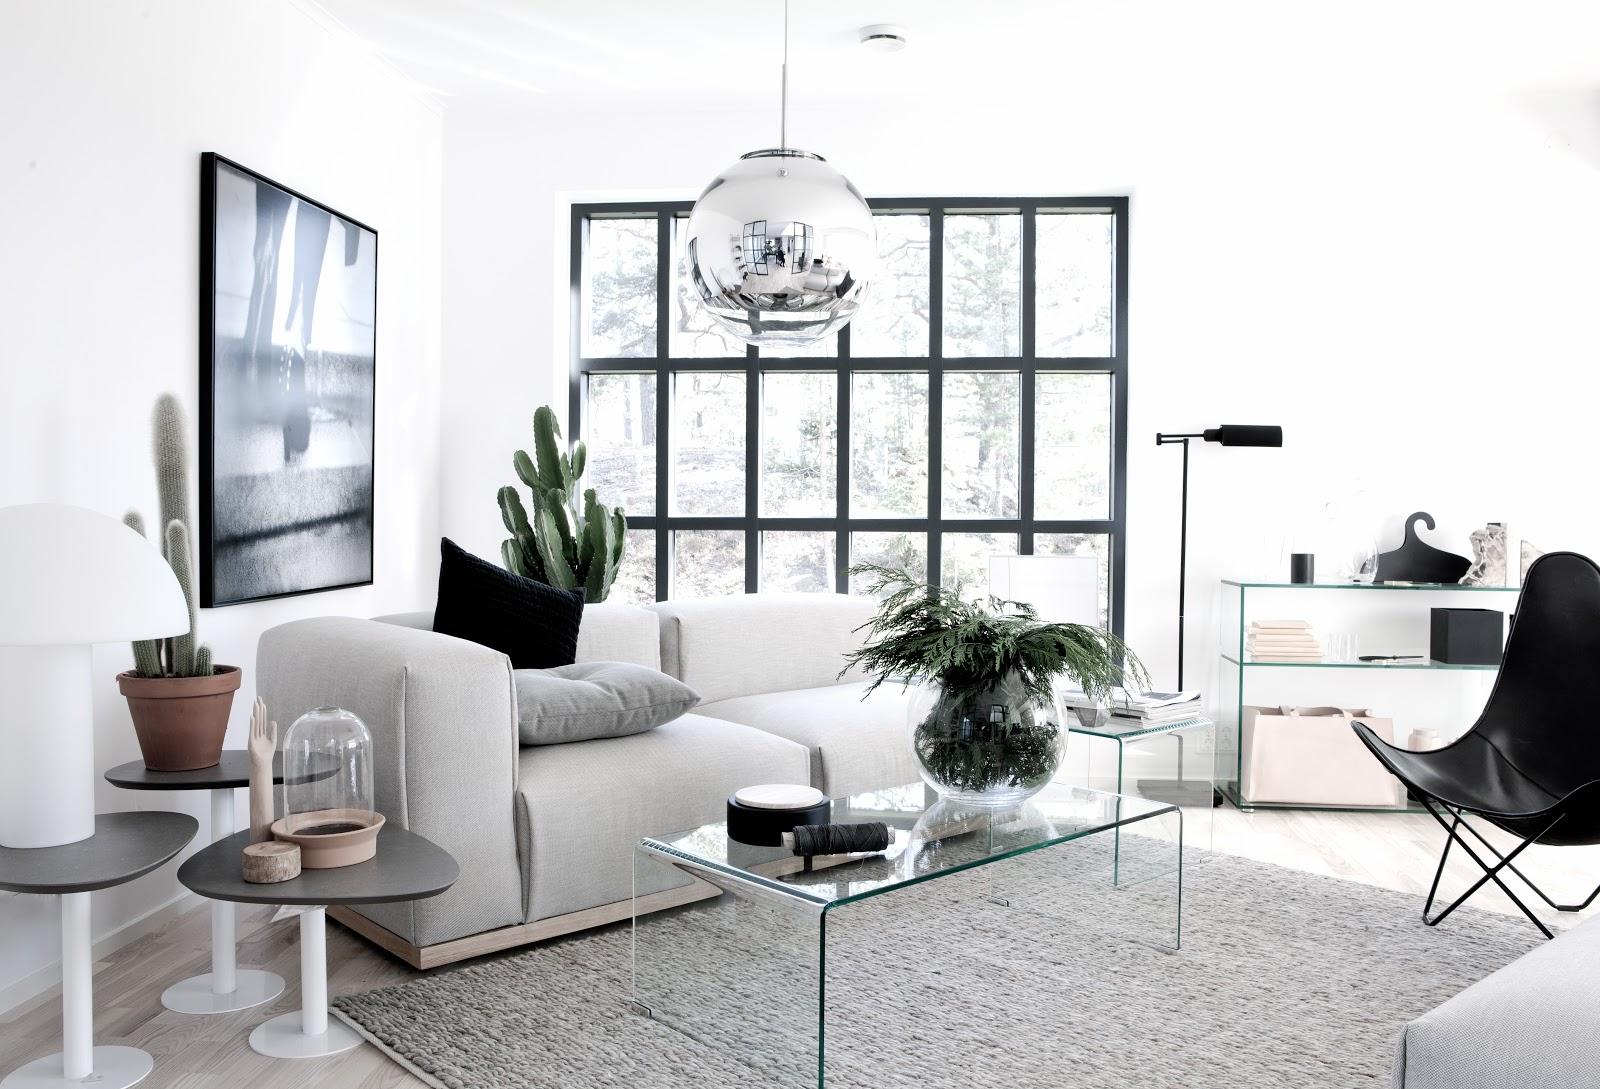 Kleur interieur een licht en wit interieur stijlvol for Interieur styling